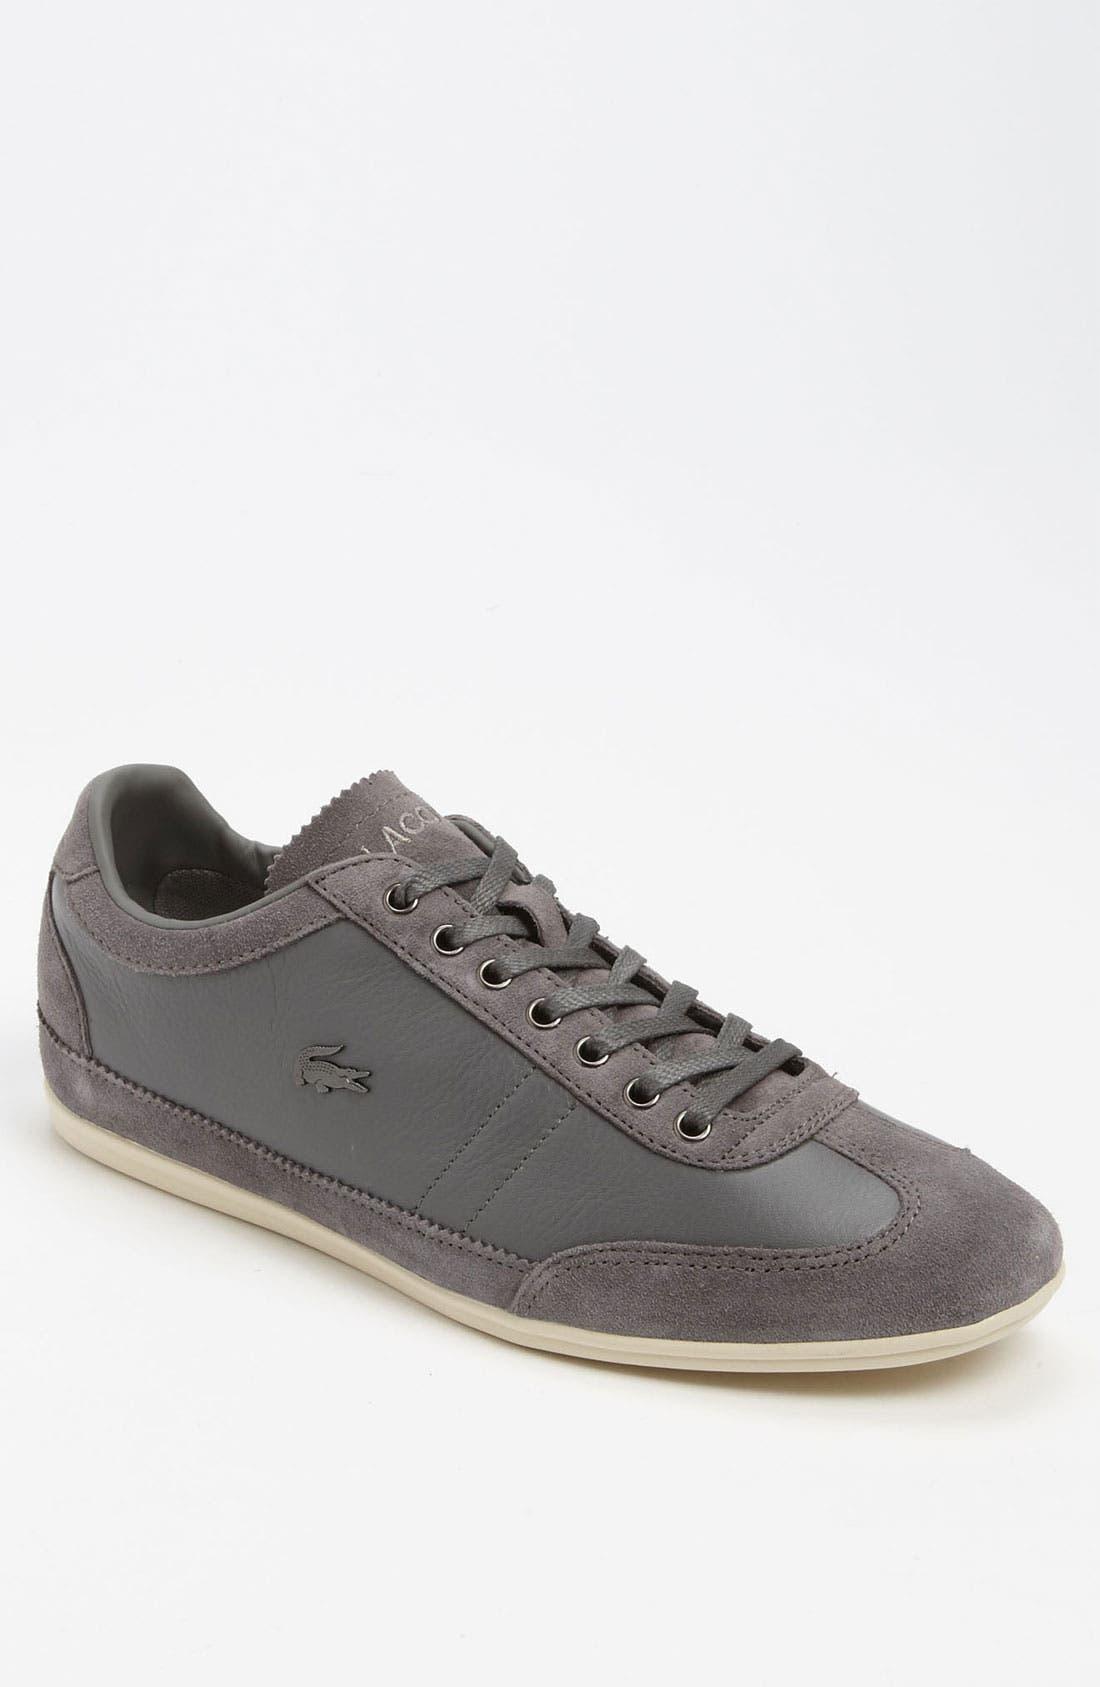 Main Image - Lacoste 'Misano 11' Sneaker